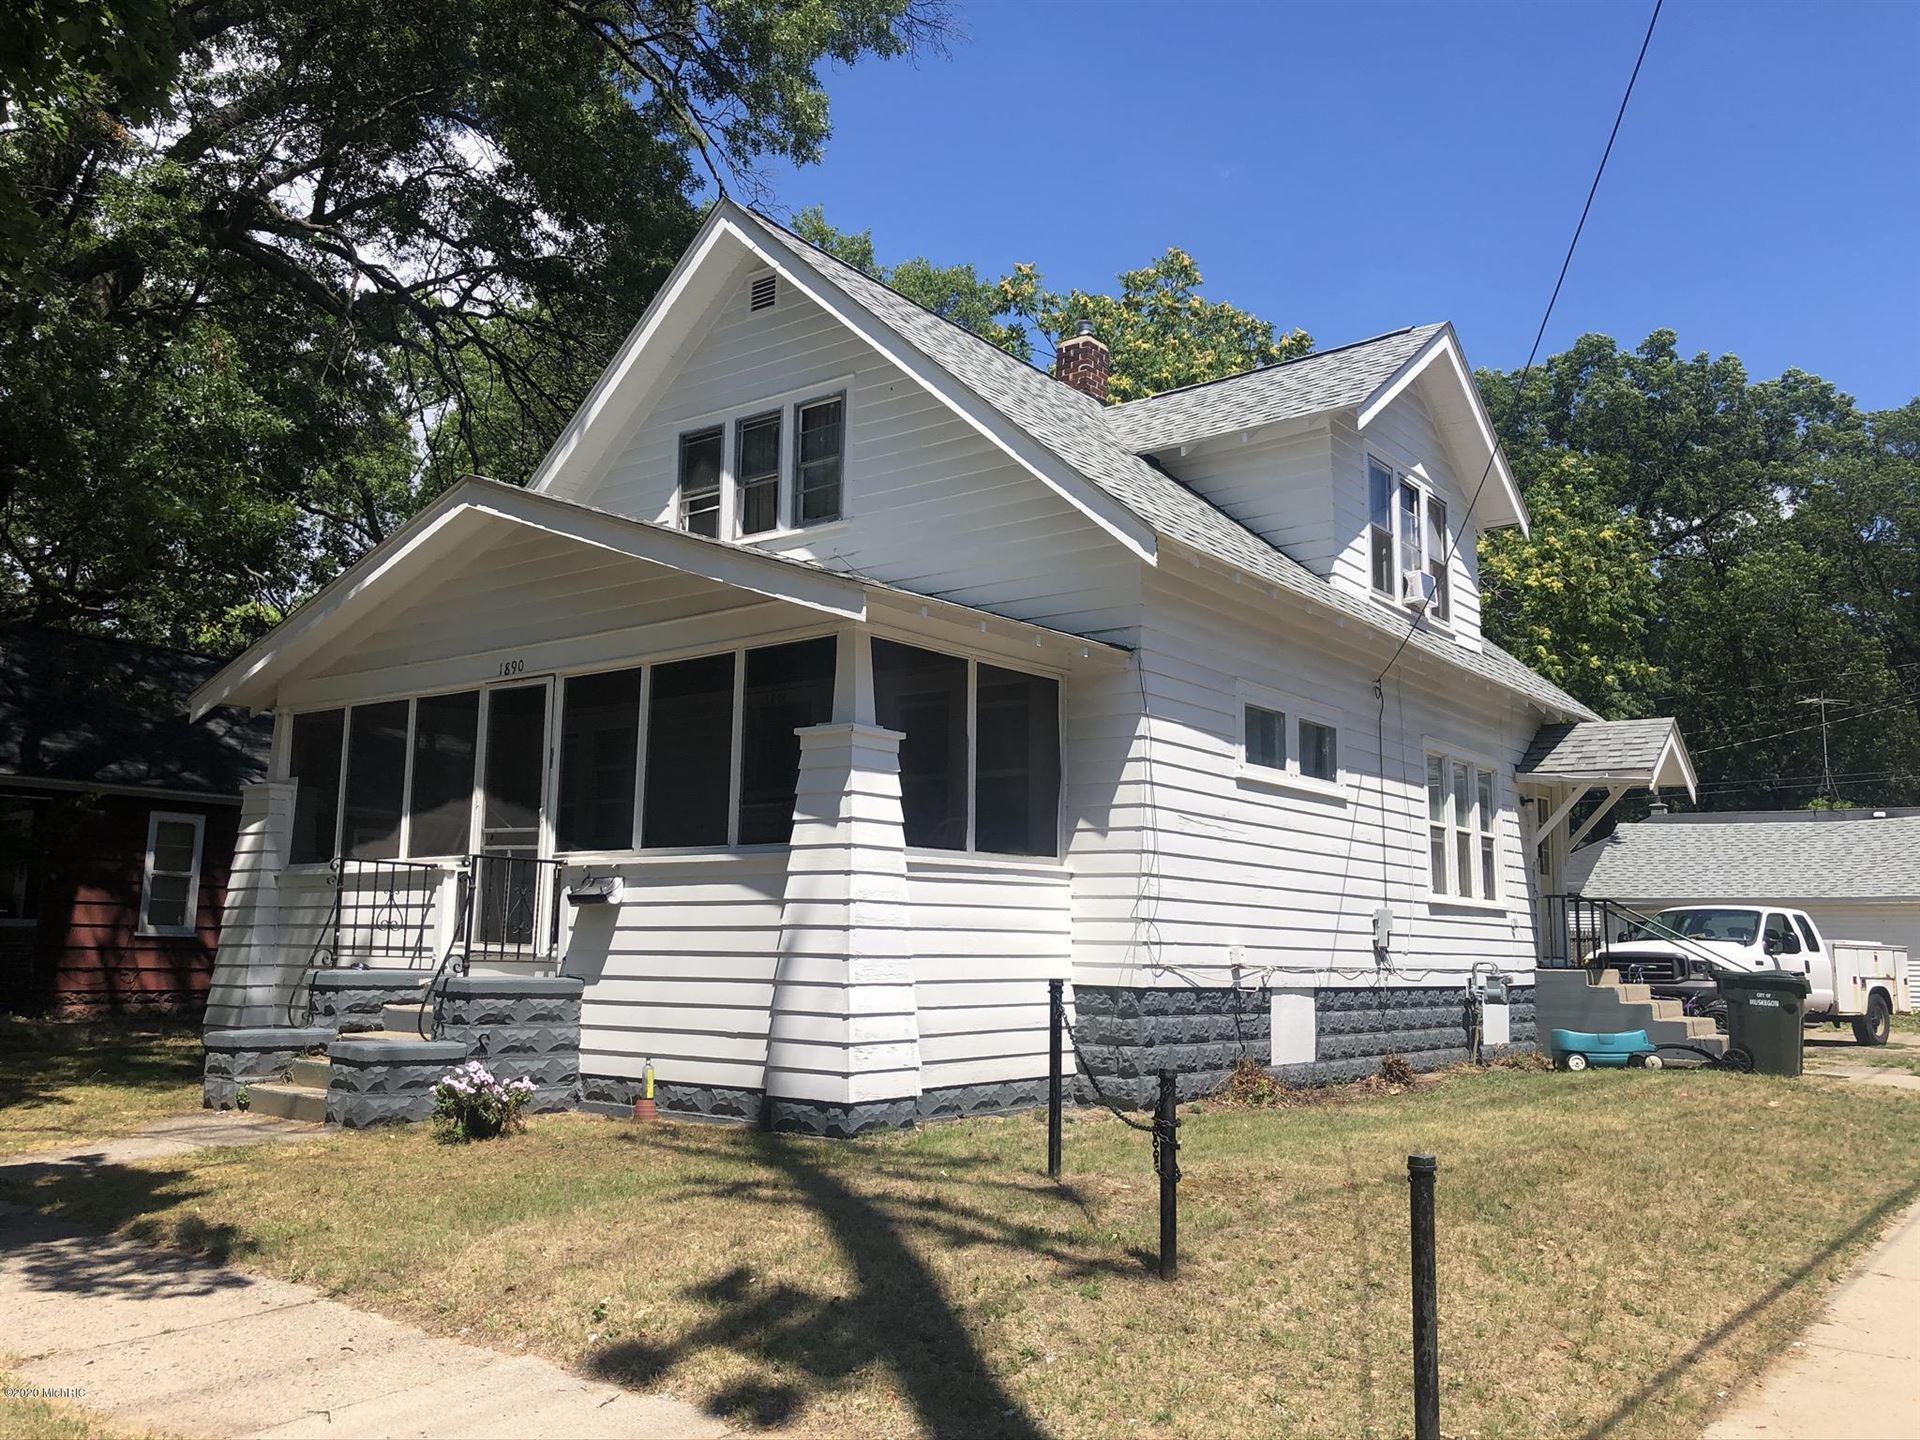 1890 Leahy Street, Muskegon, MI 49442 - MLS#: 20027902